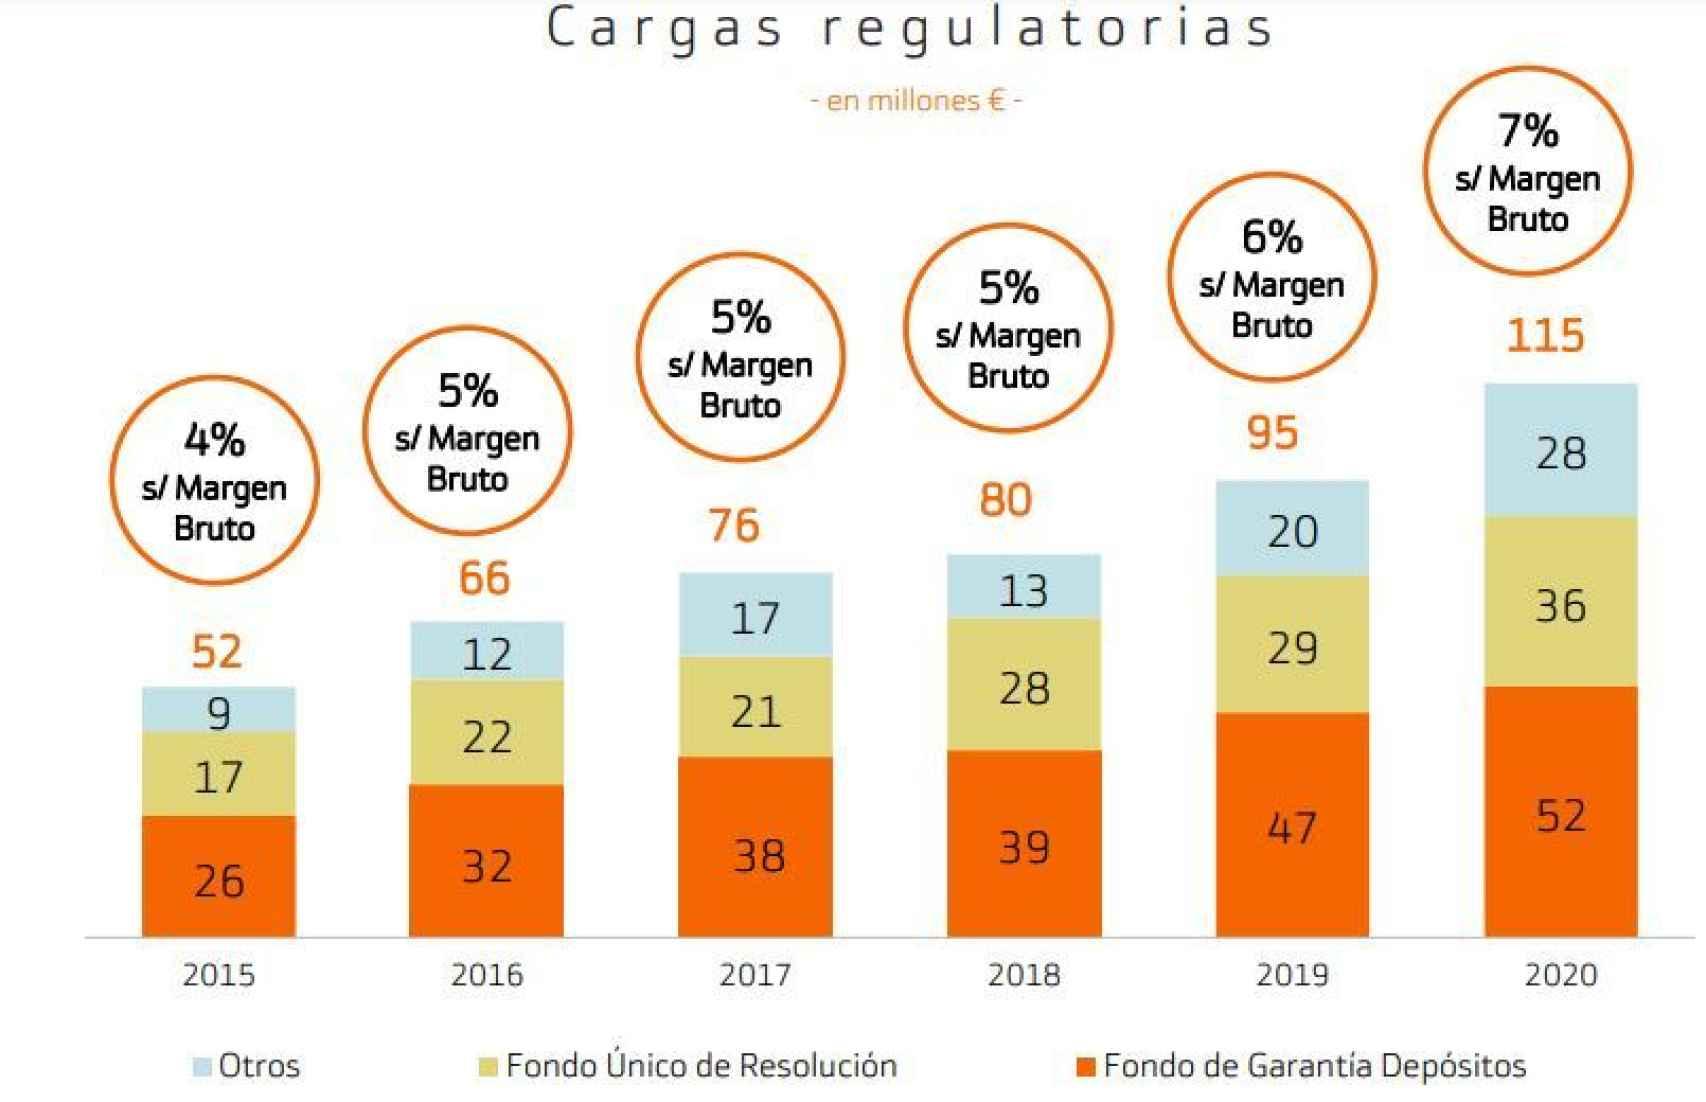 Cargas regulatorias